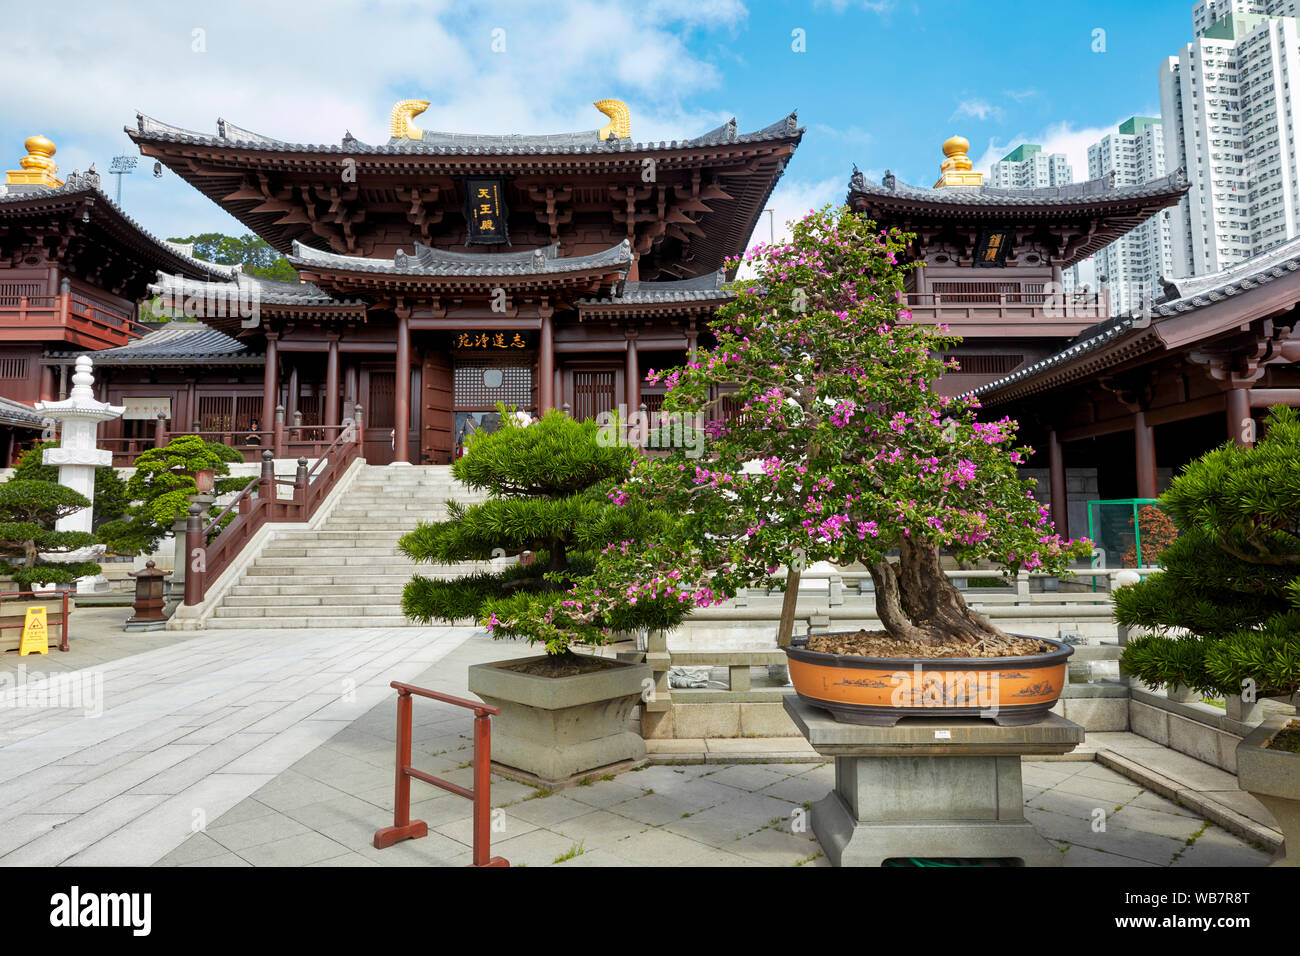 Chi Lin Nunnery, large Buddhist temple complex. Diamond Hill, Kowloon, Hong Kong, China. Stock Photo